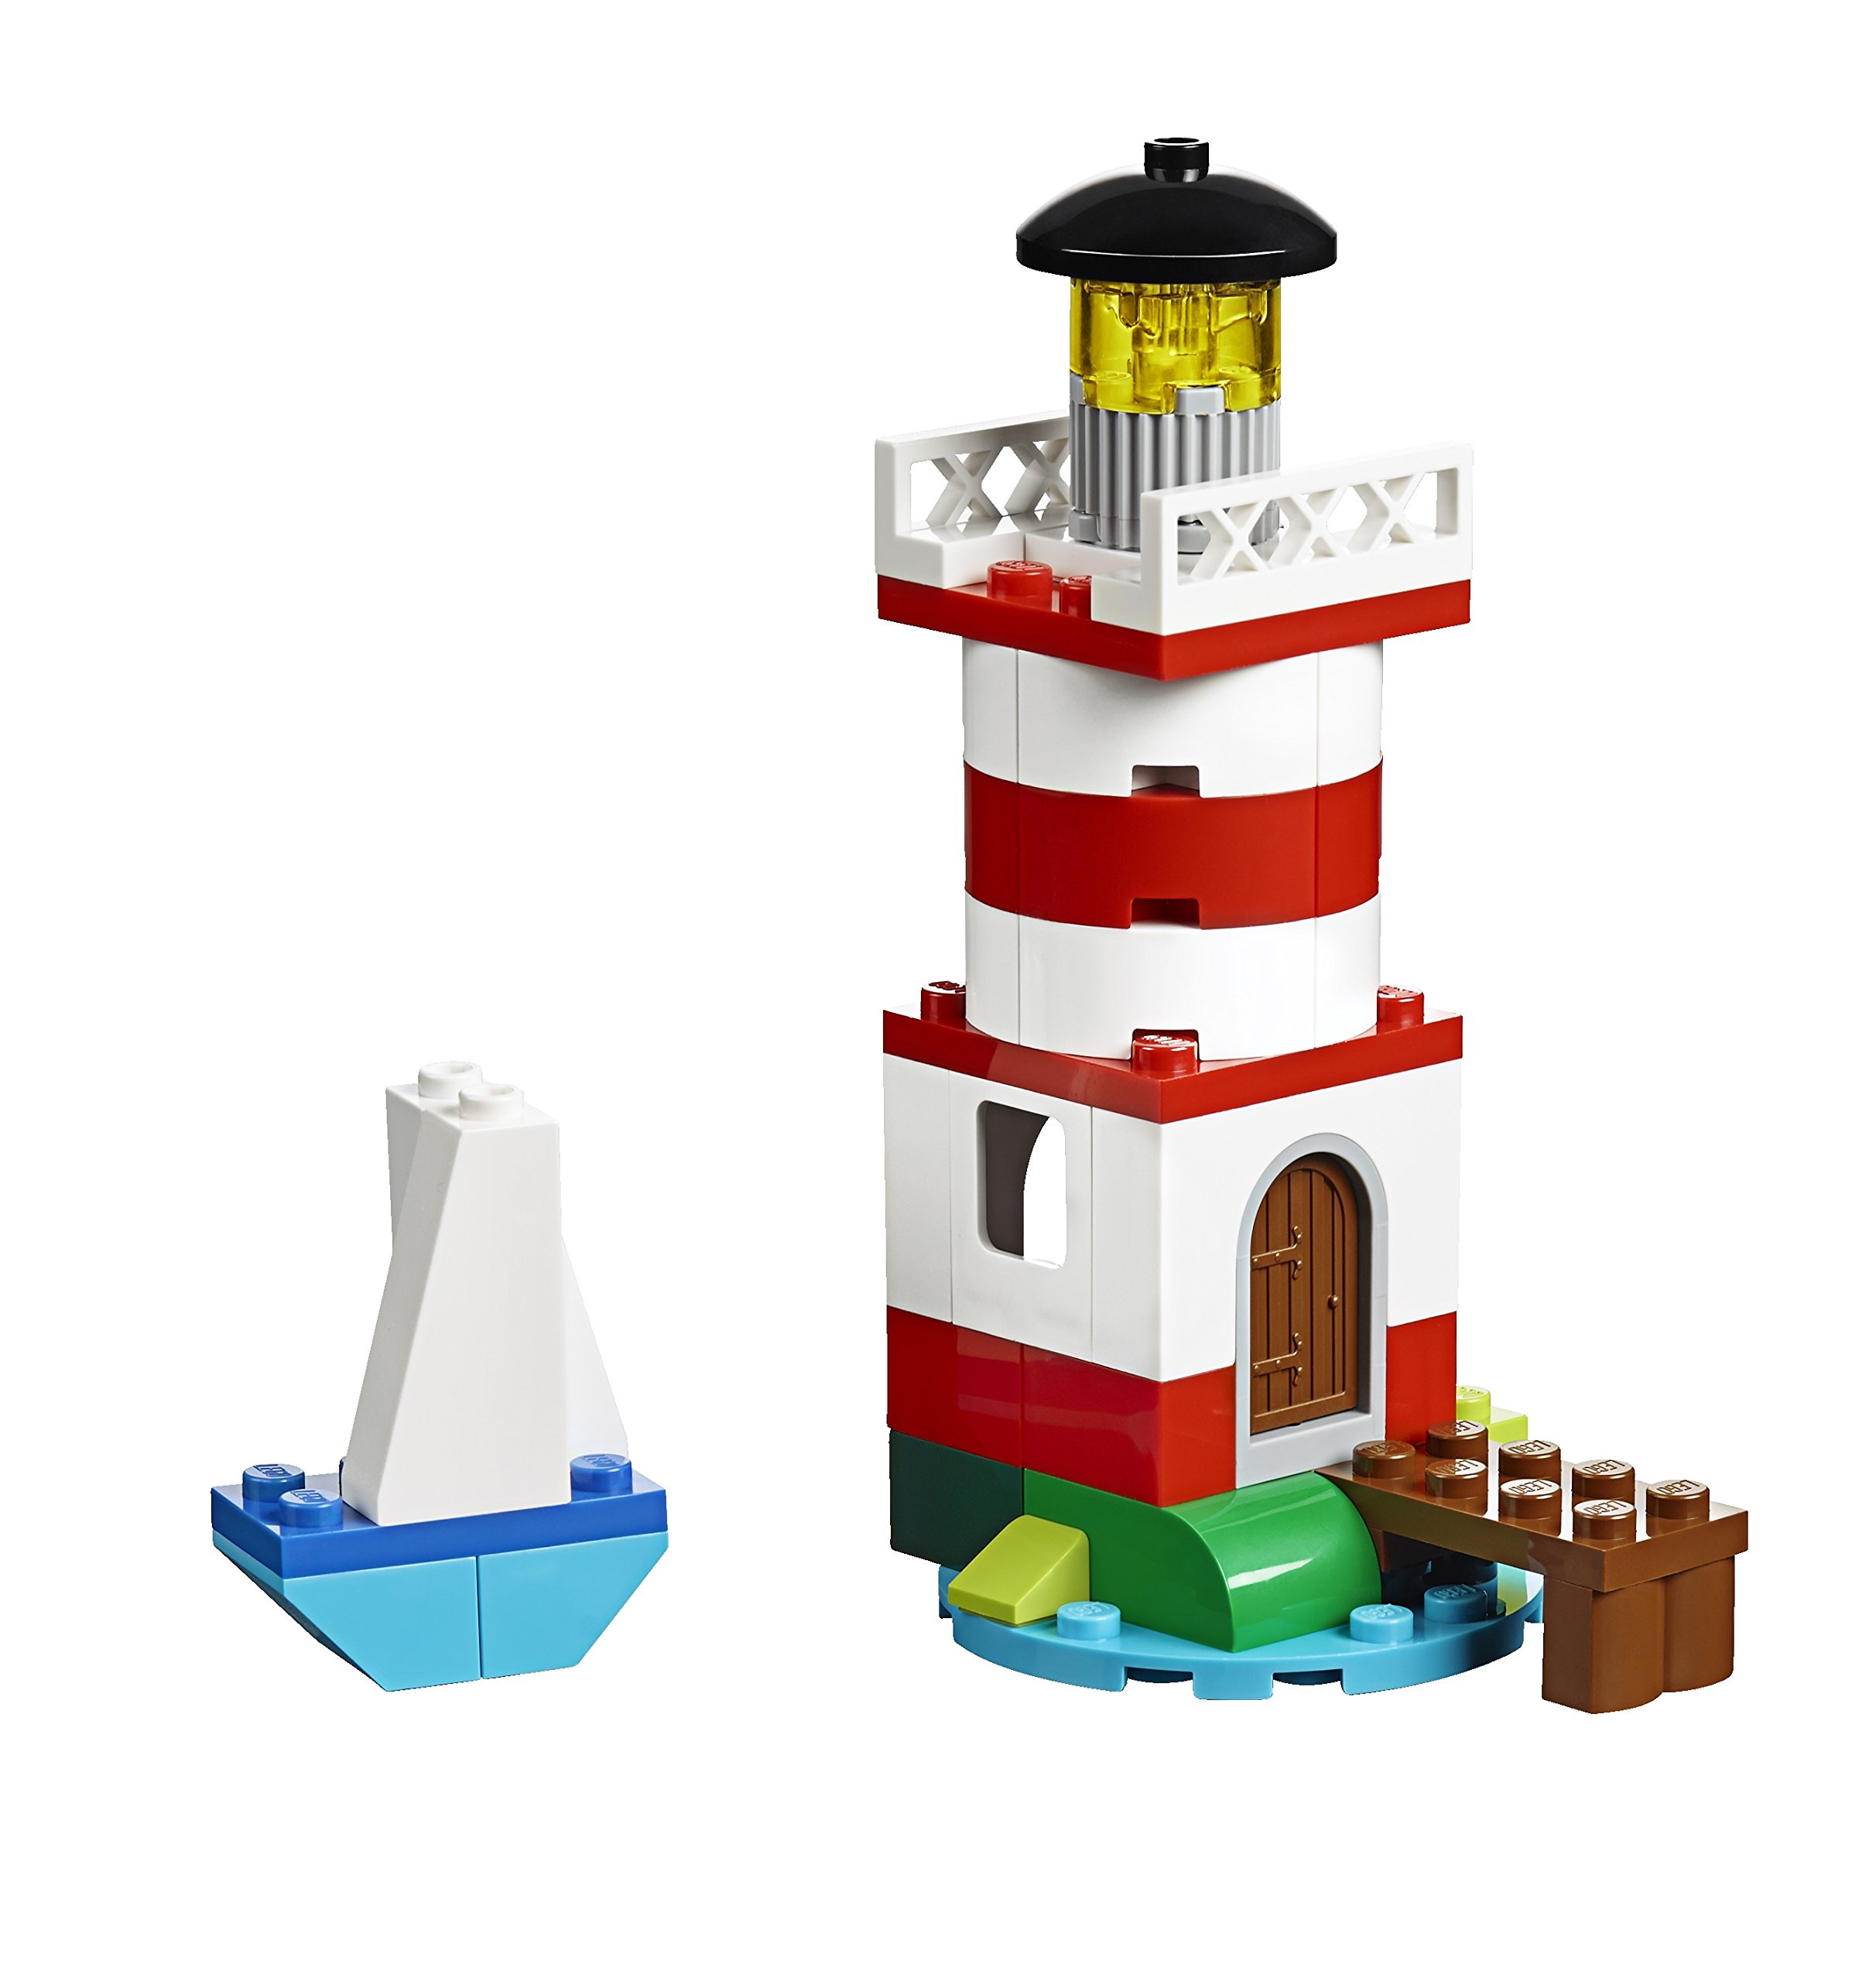 LEGO Classic Creative Bricks 10692 Building Blocks, Learning Toy by LEGO (Image #8)